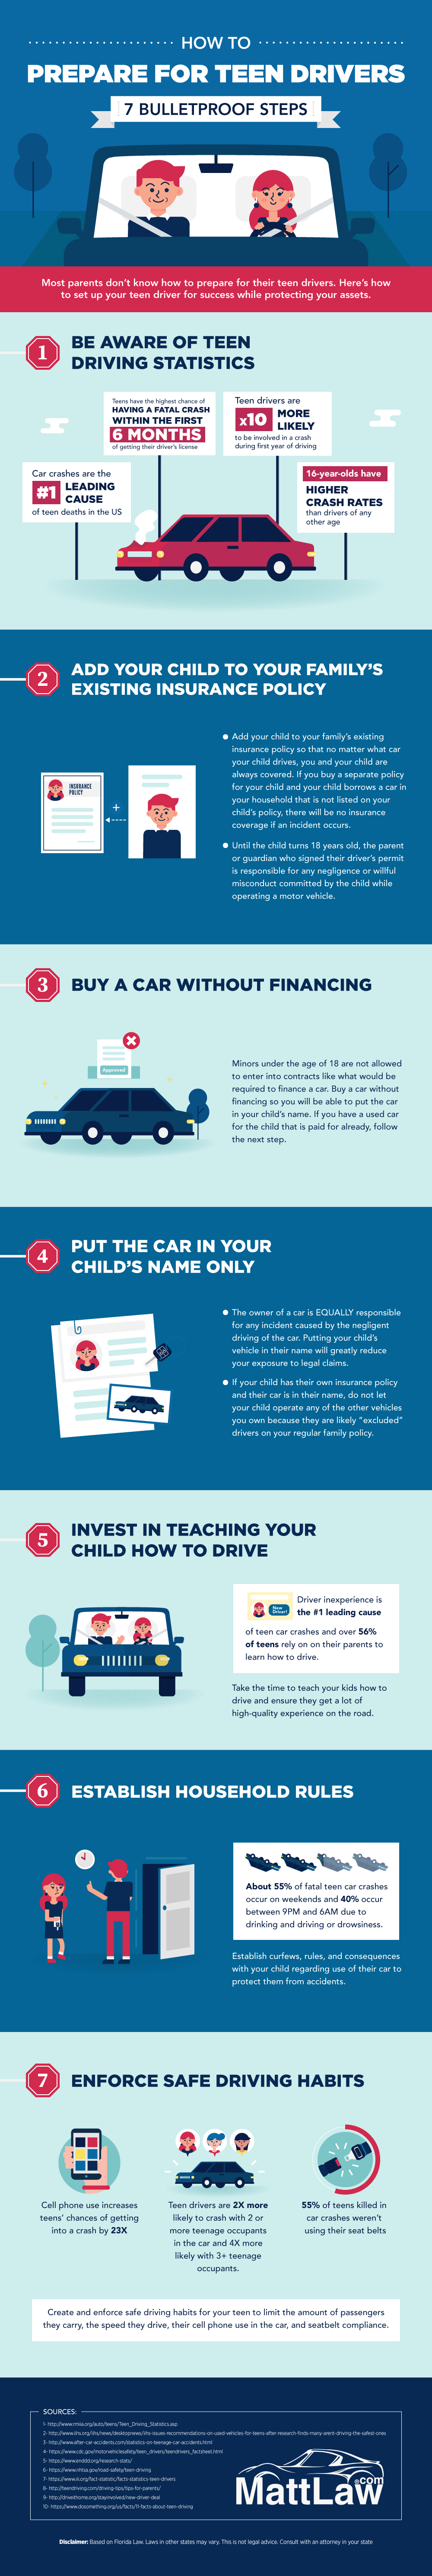 How to Prepare for Teen Drivers (7 Bulletproof Steps) - MattLaw™